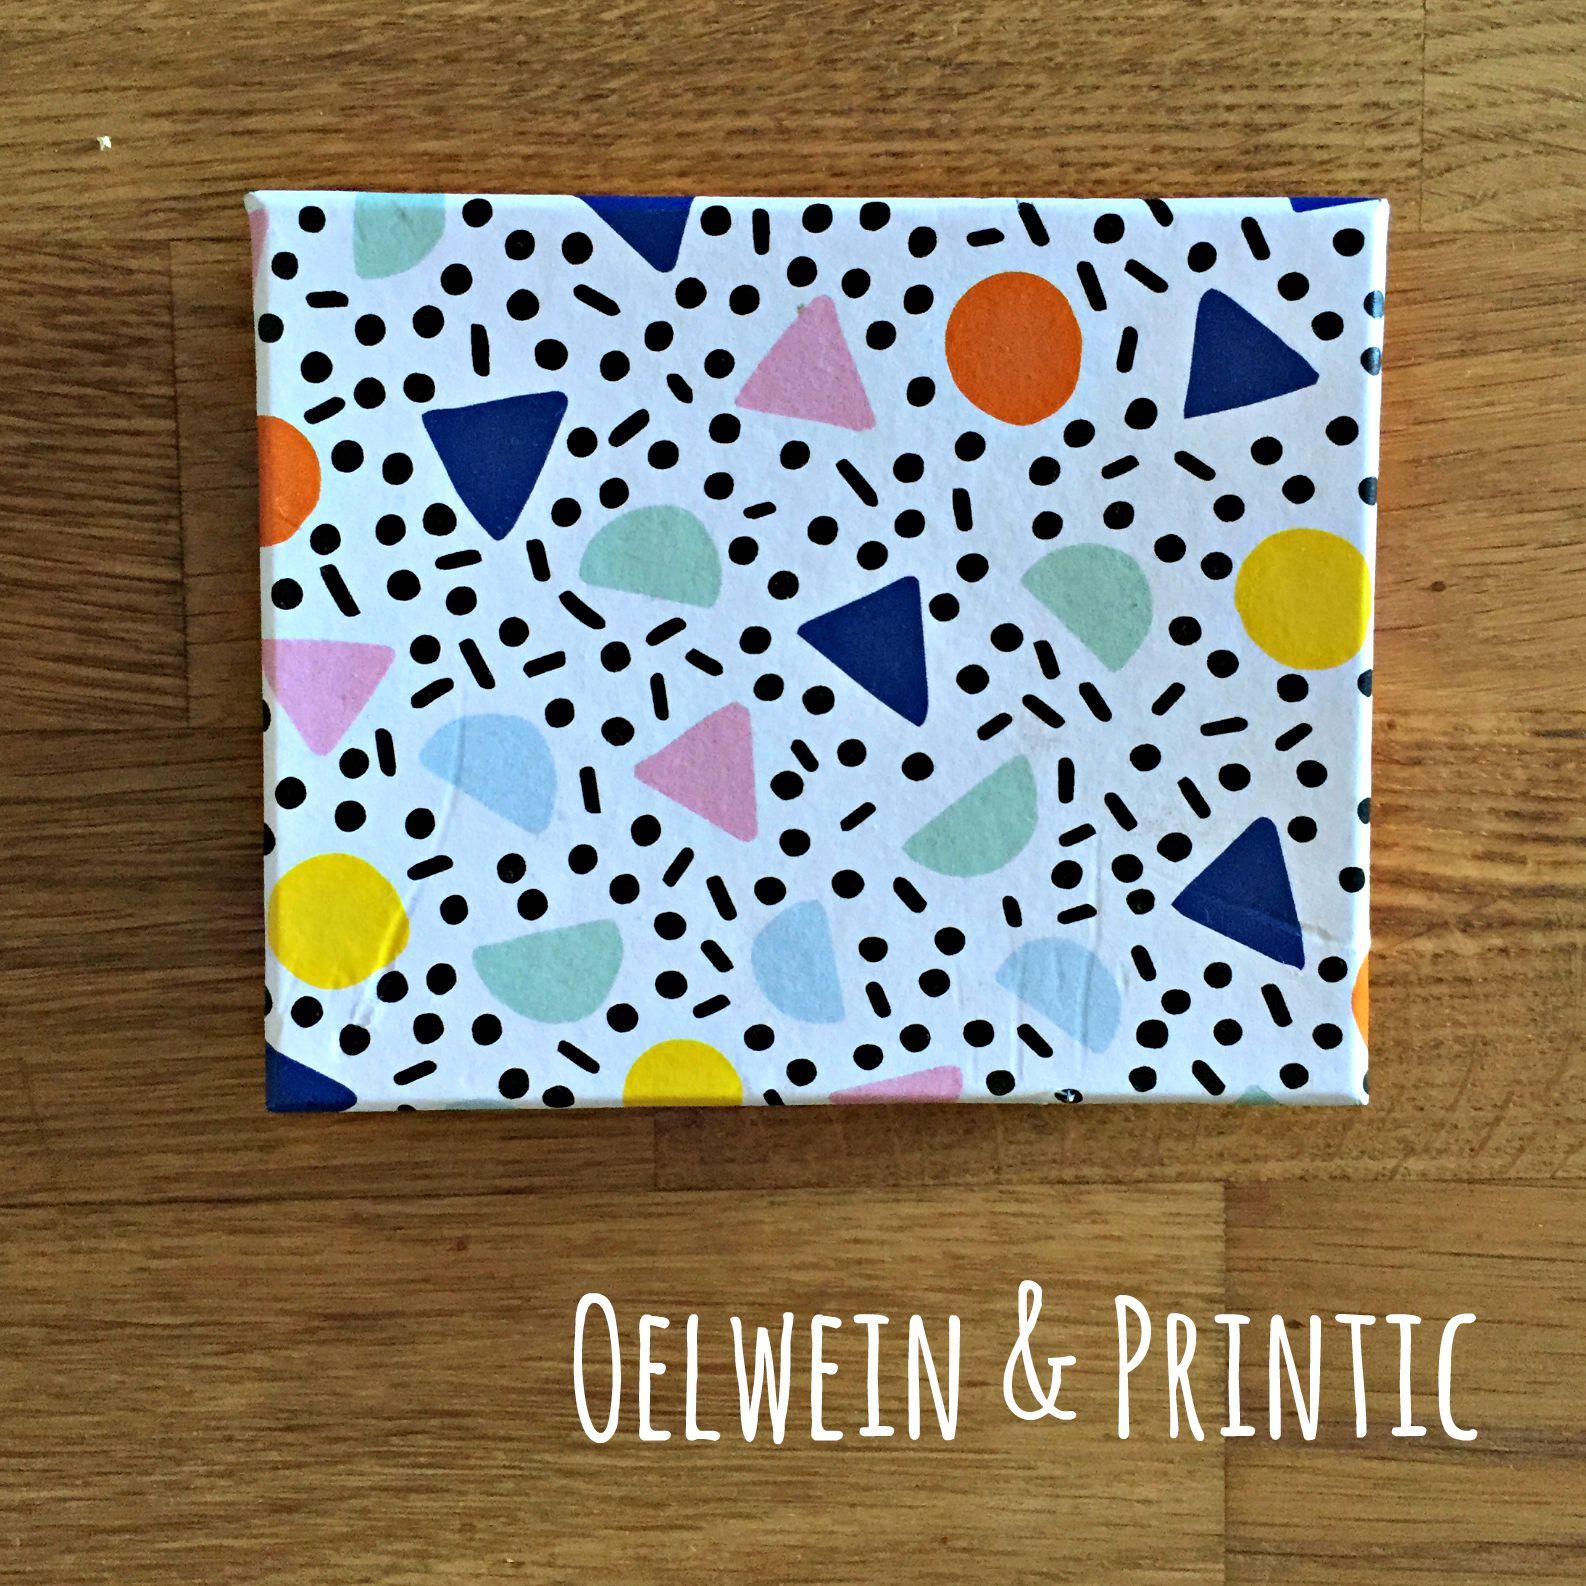 Oelwein & Printic